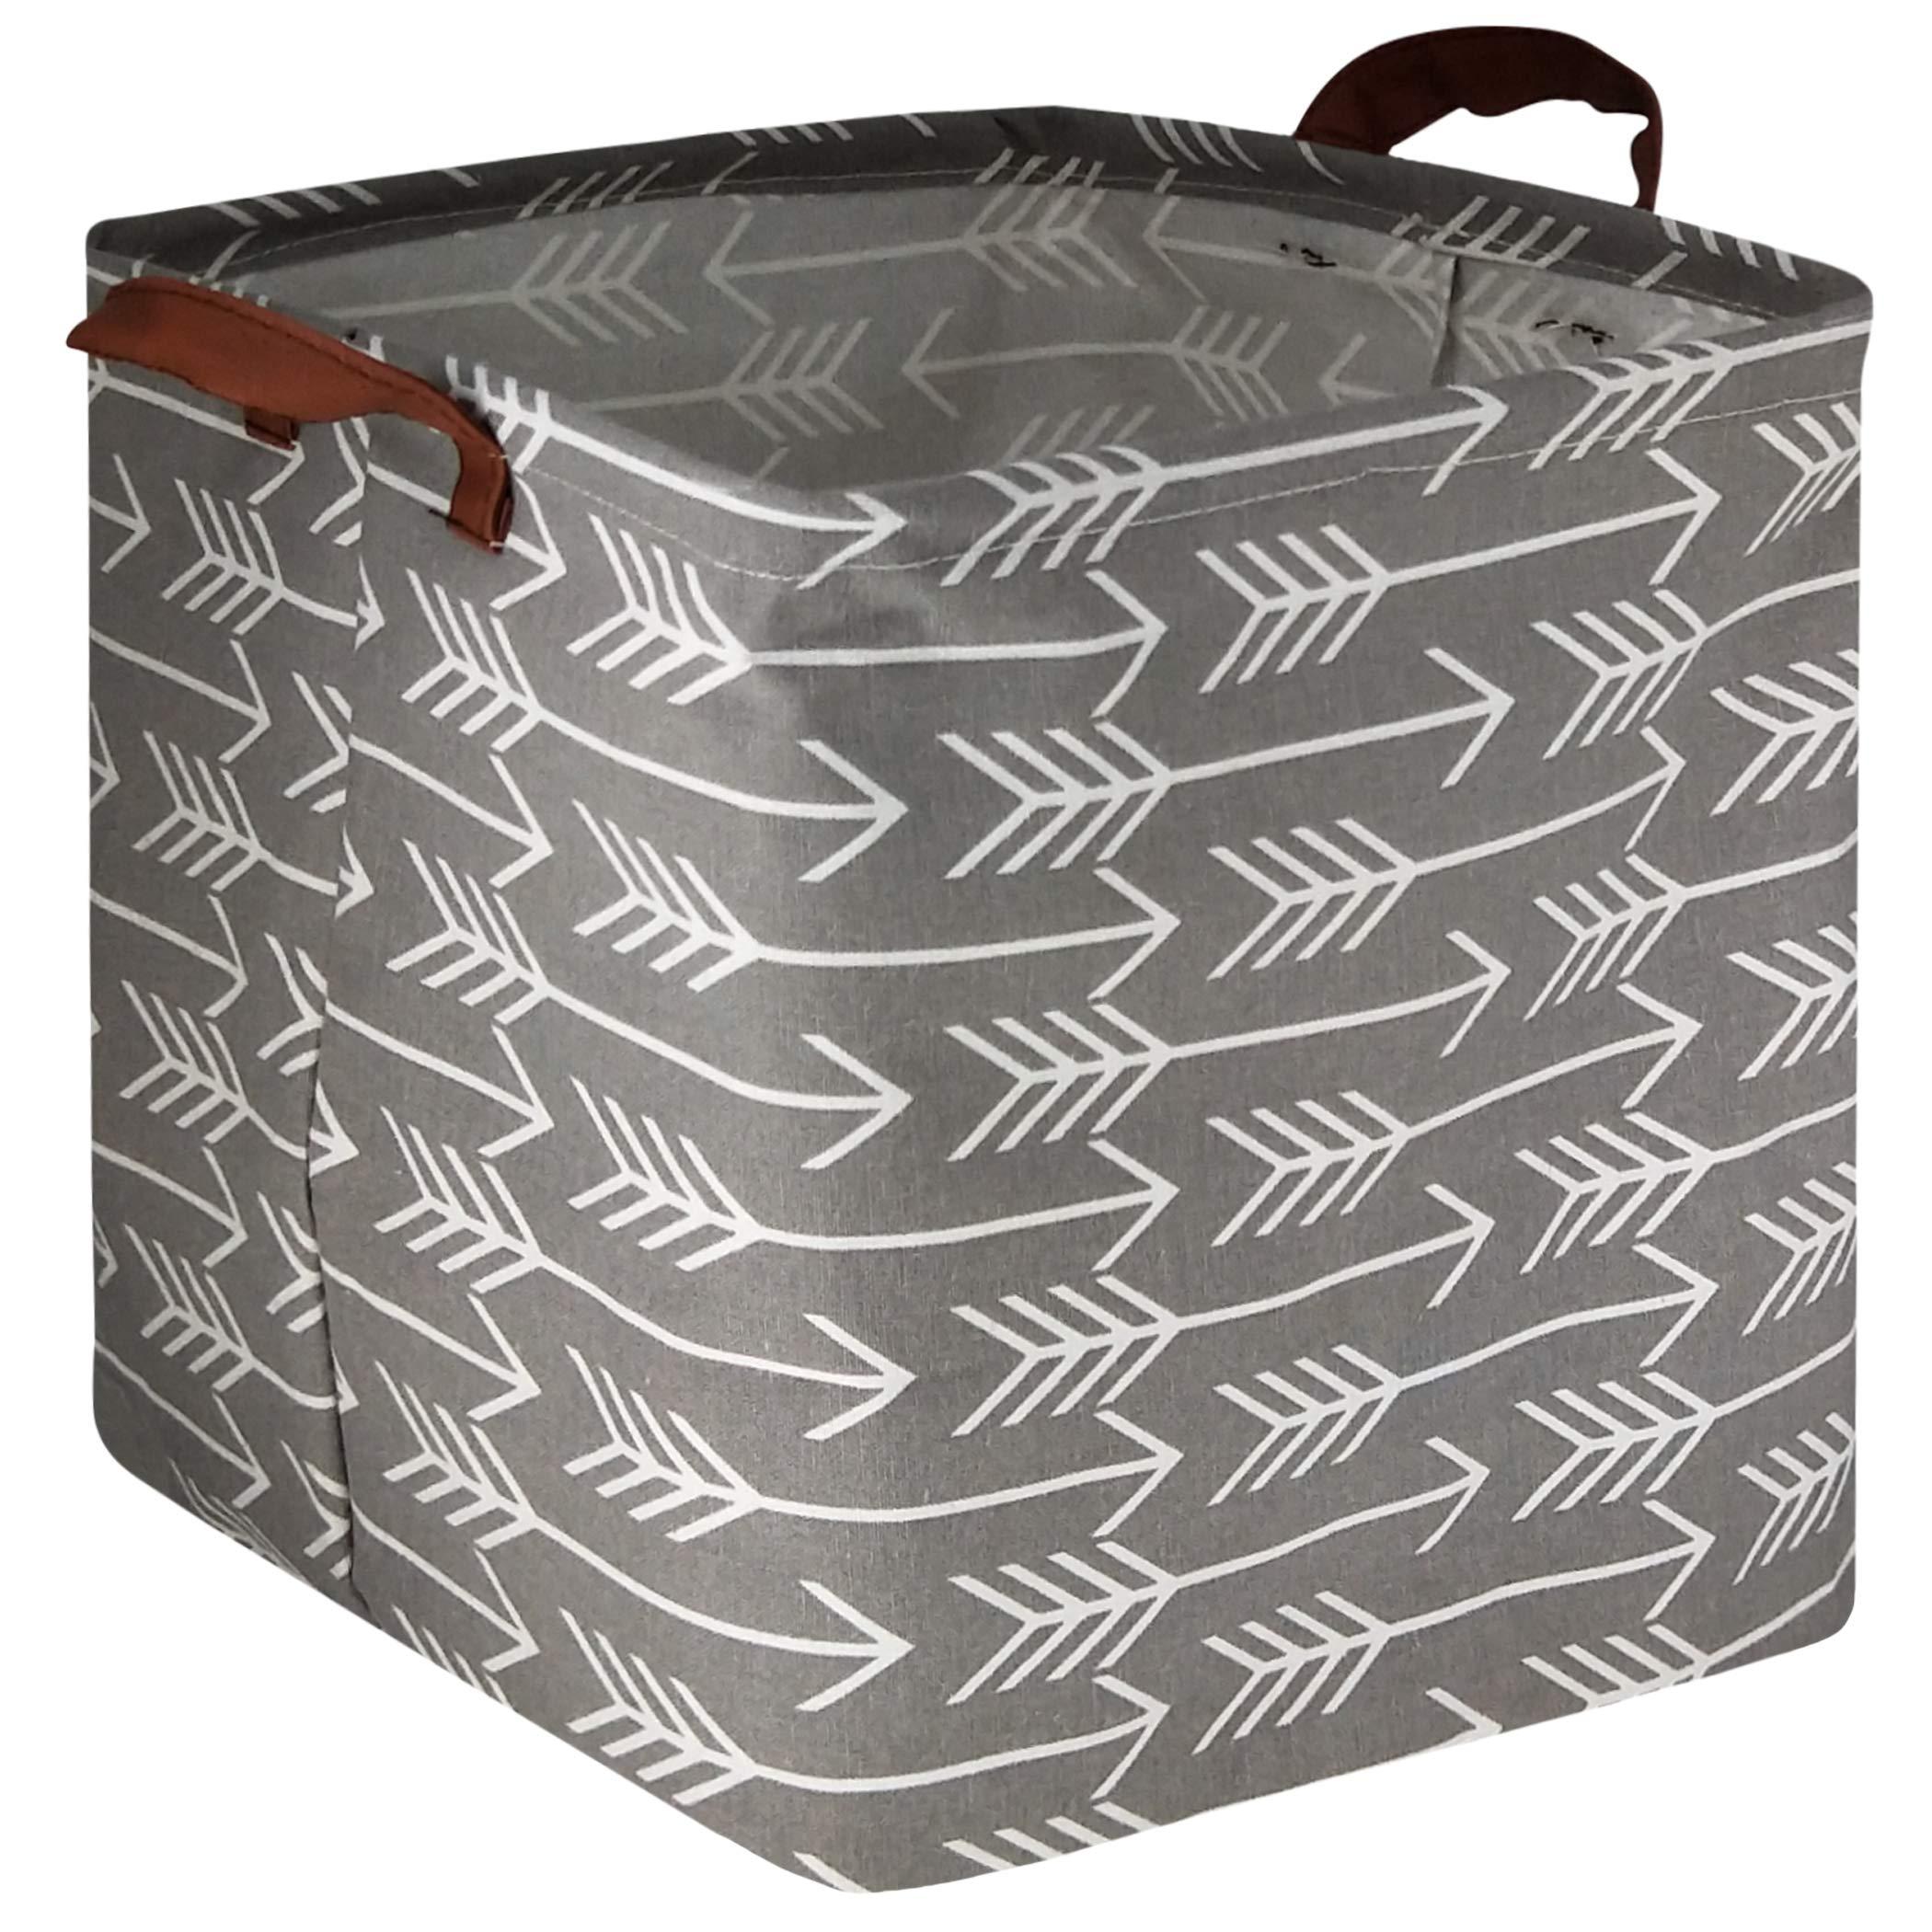 HIYAGON Square Storage Bins,Storage Baskets,Canvas Fabric Storage Boxes,Foldable Nursery Basket for Clothes,Books,Shelves Baskets,Gift Baskets,Home Organization,Room Decor(Grey Arrow)